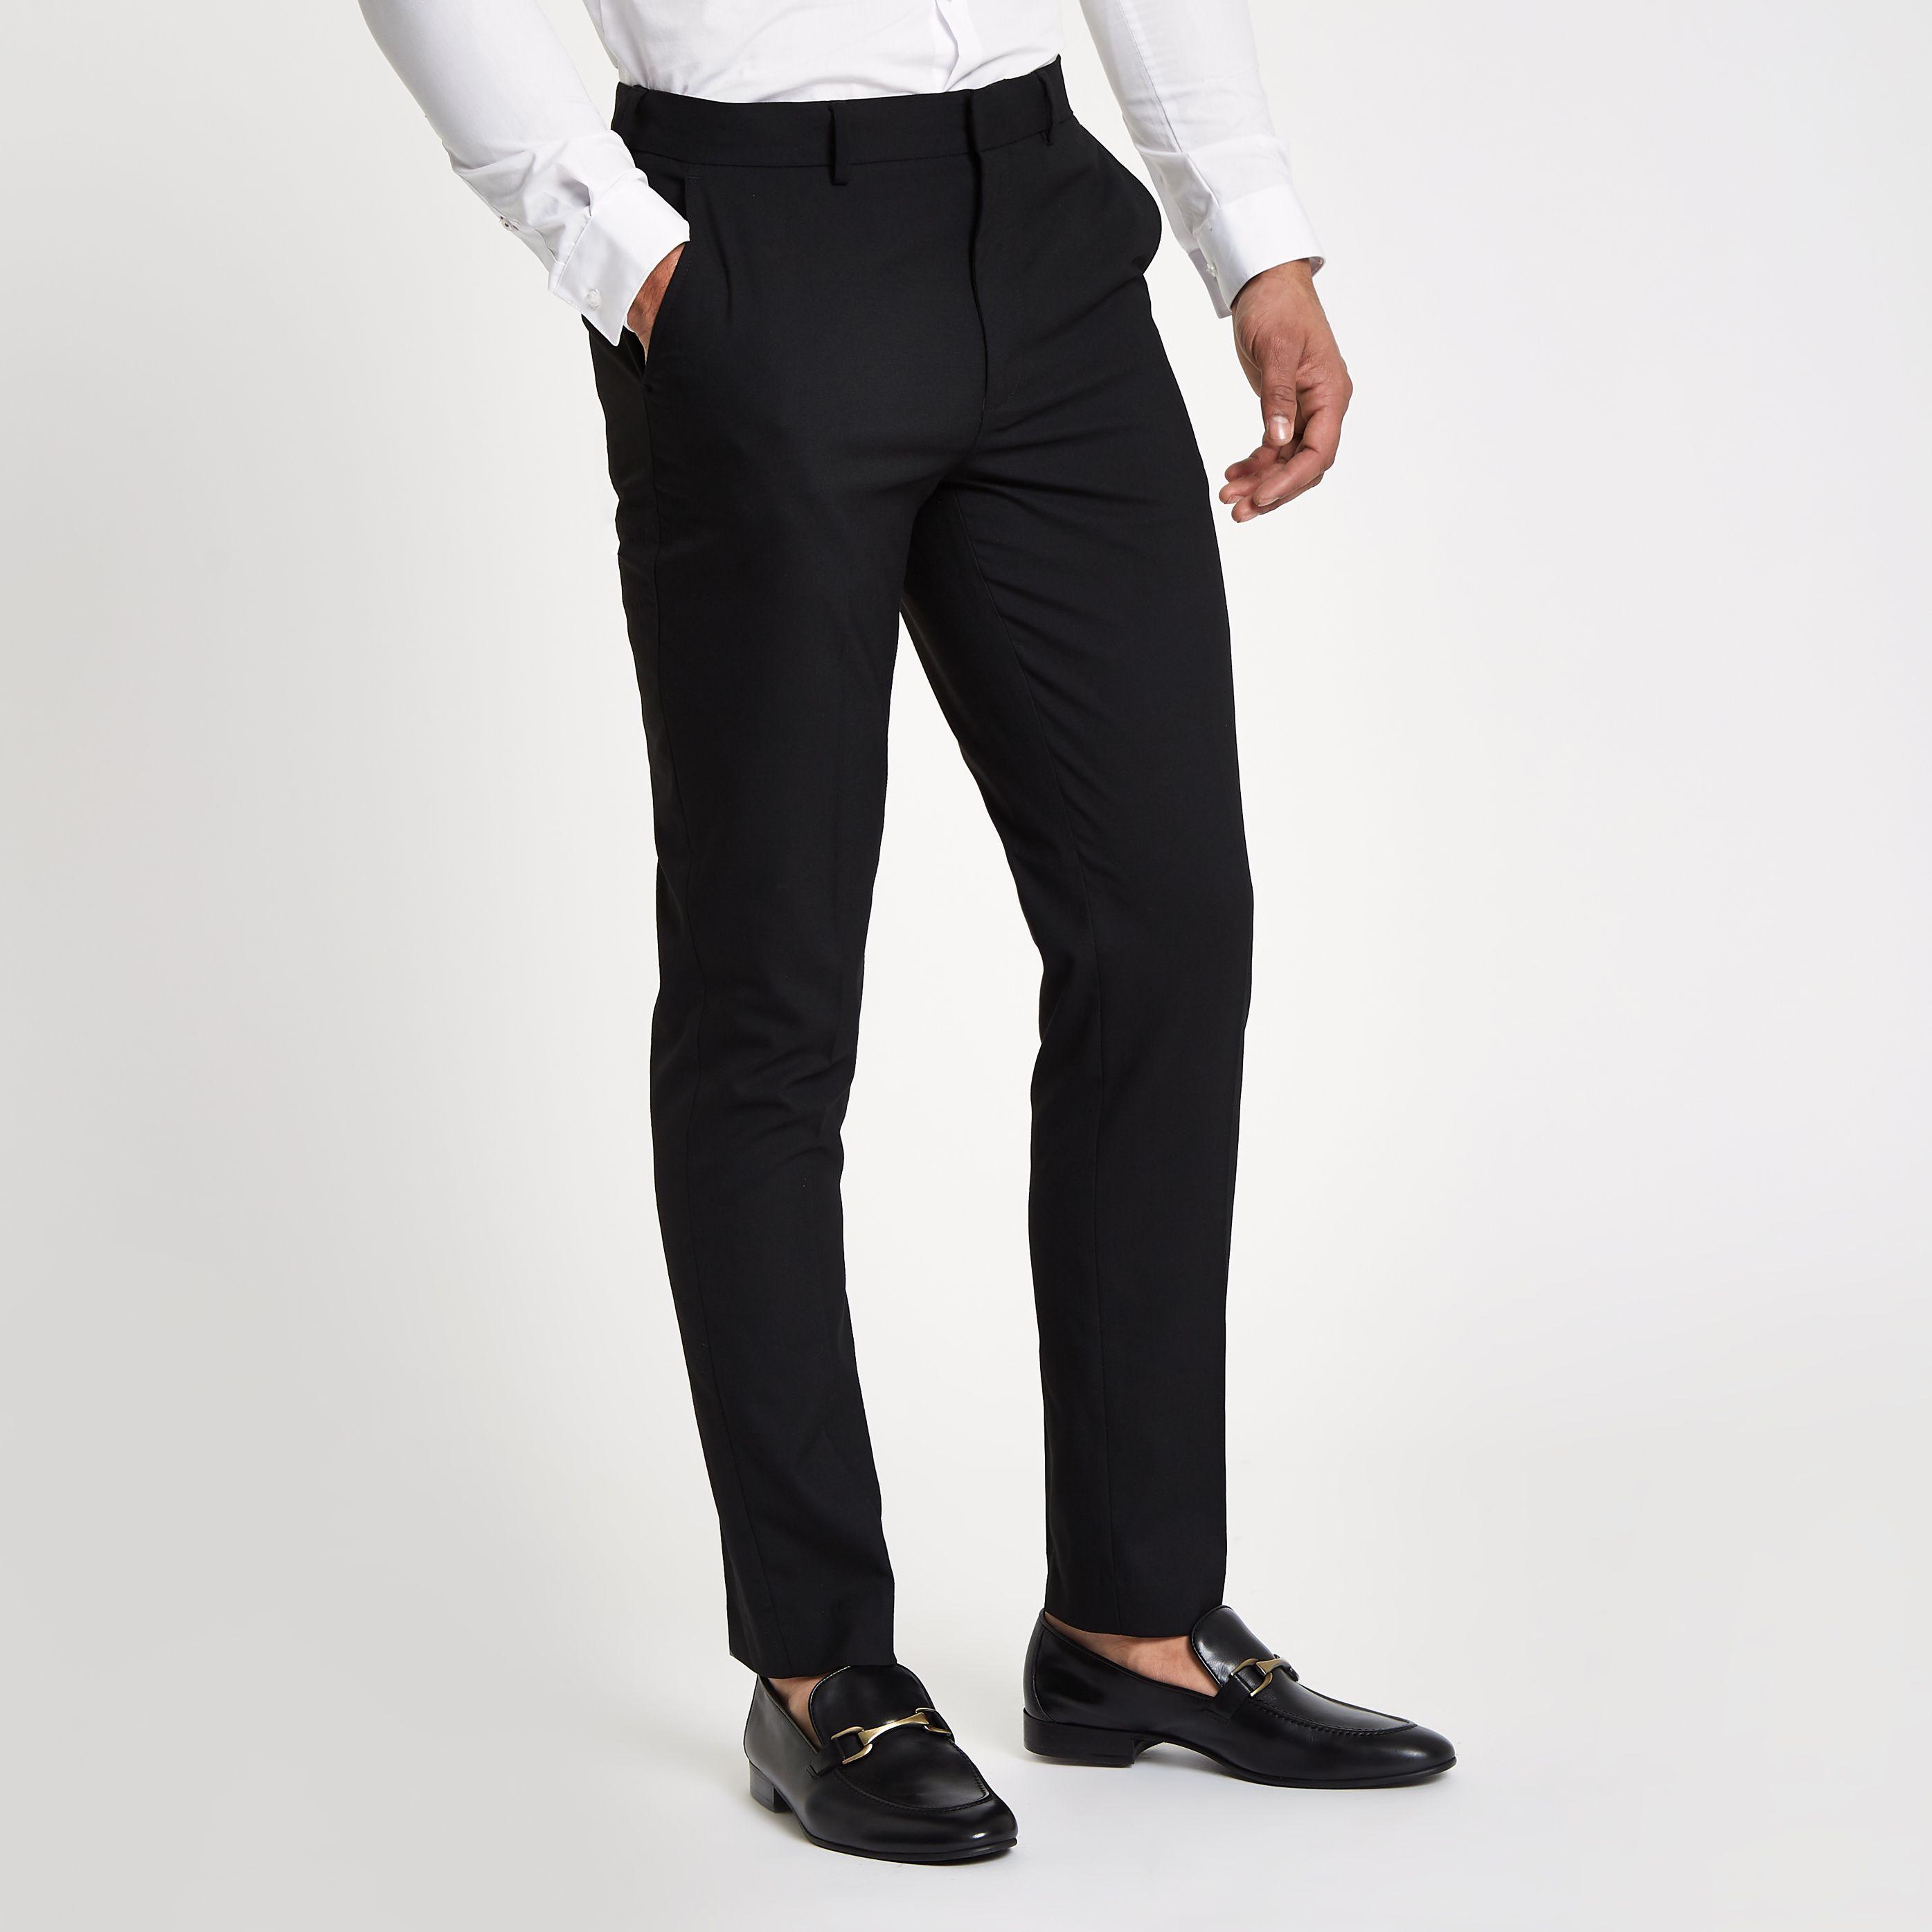 Black Slim Fit Smart Trousers Black Pants Men Black Dress Pants Men Slim Fit [ 2790 x 2790 Pixel ]